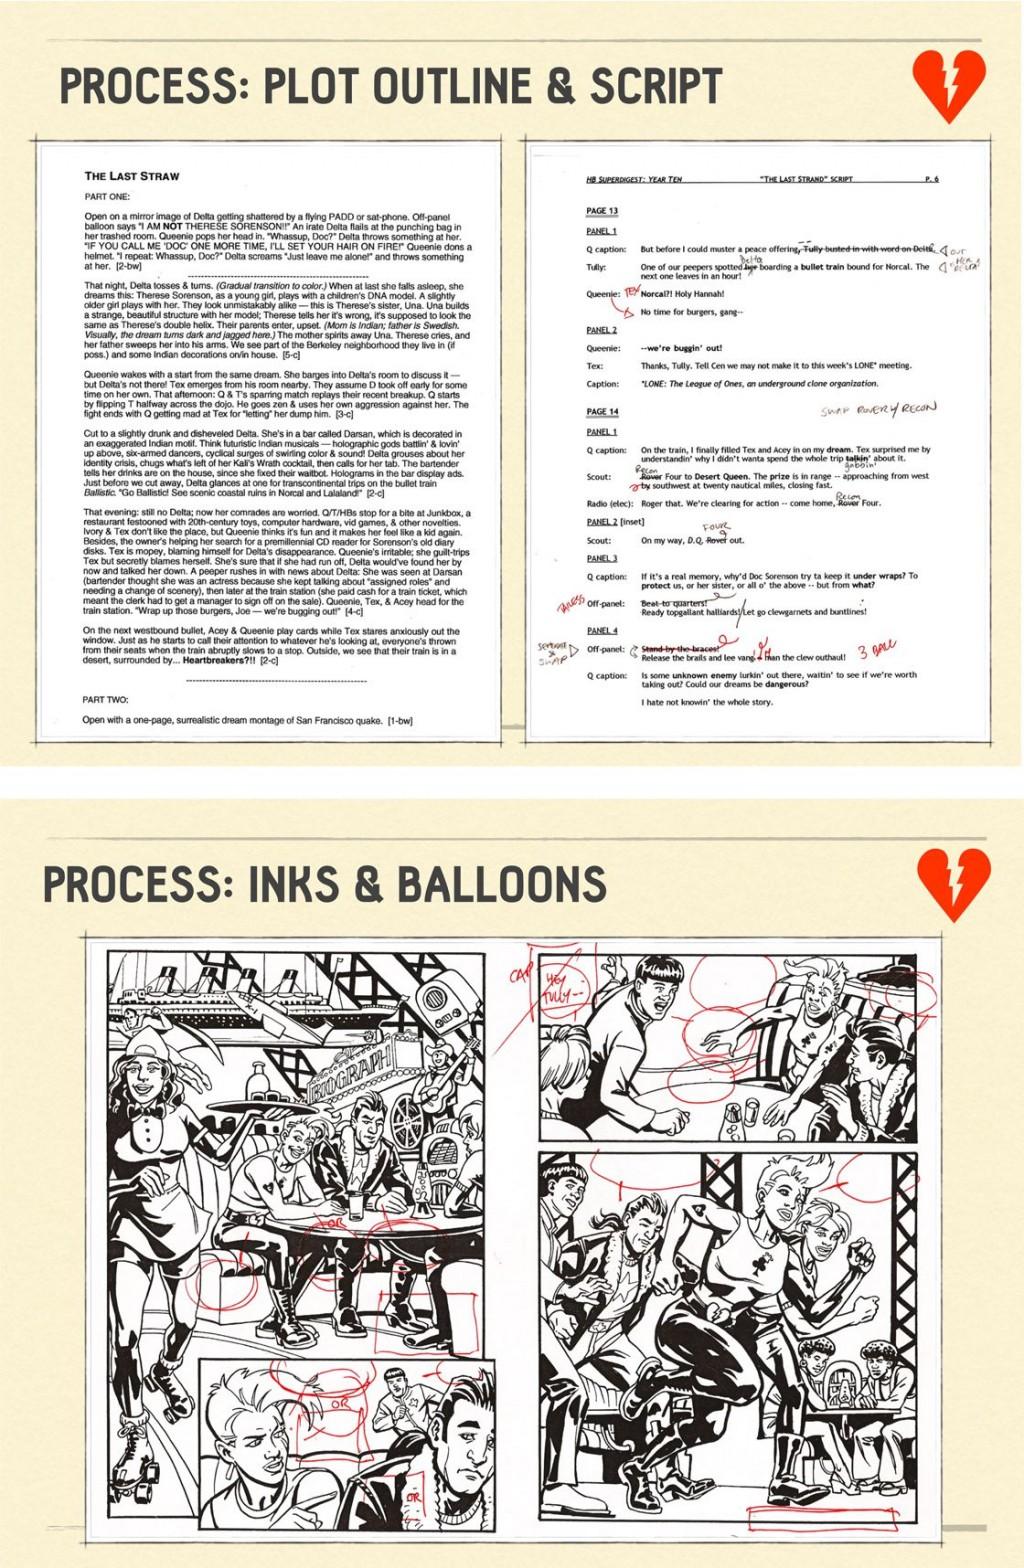 005 Dreaded Comic Book Script Sample Image  Marvel CeltxLarge